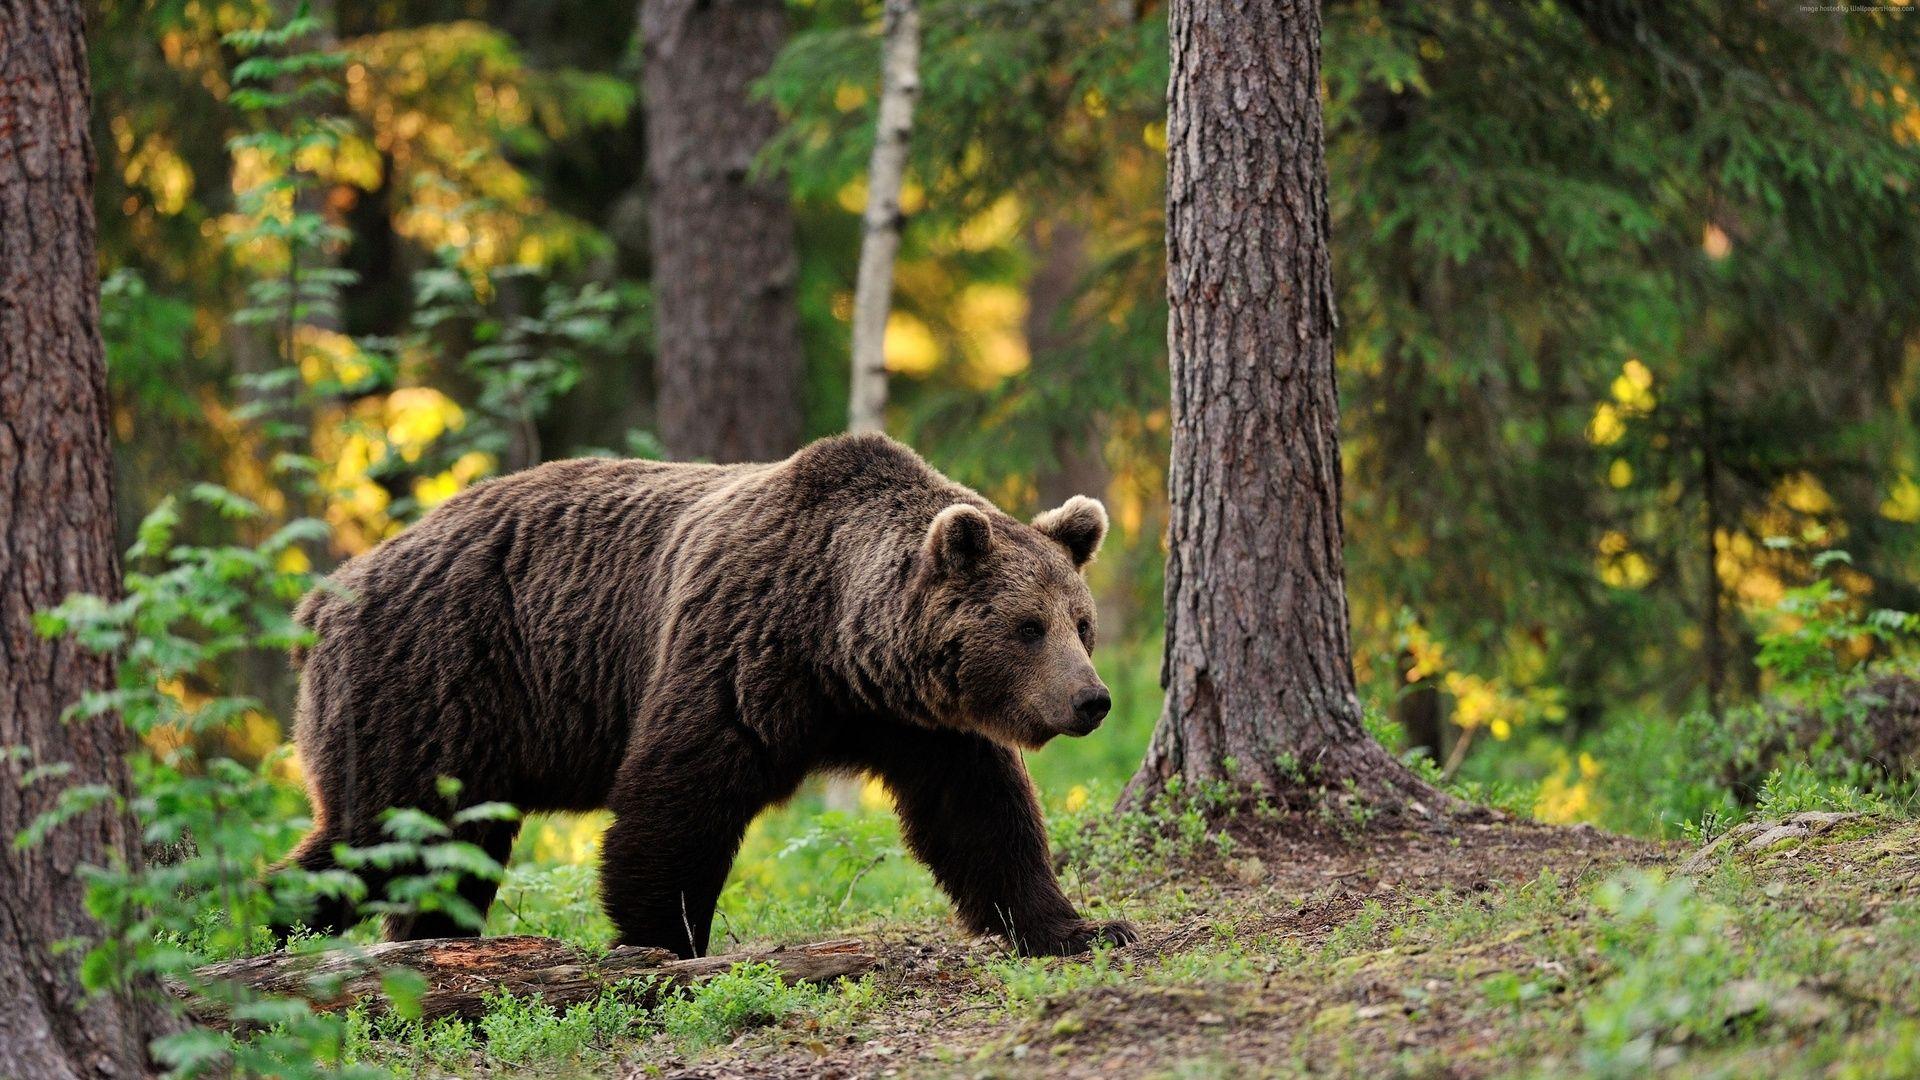 Brown Bear, Forest, Trees, Original